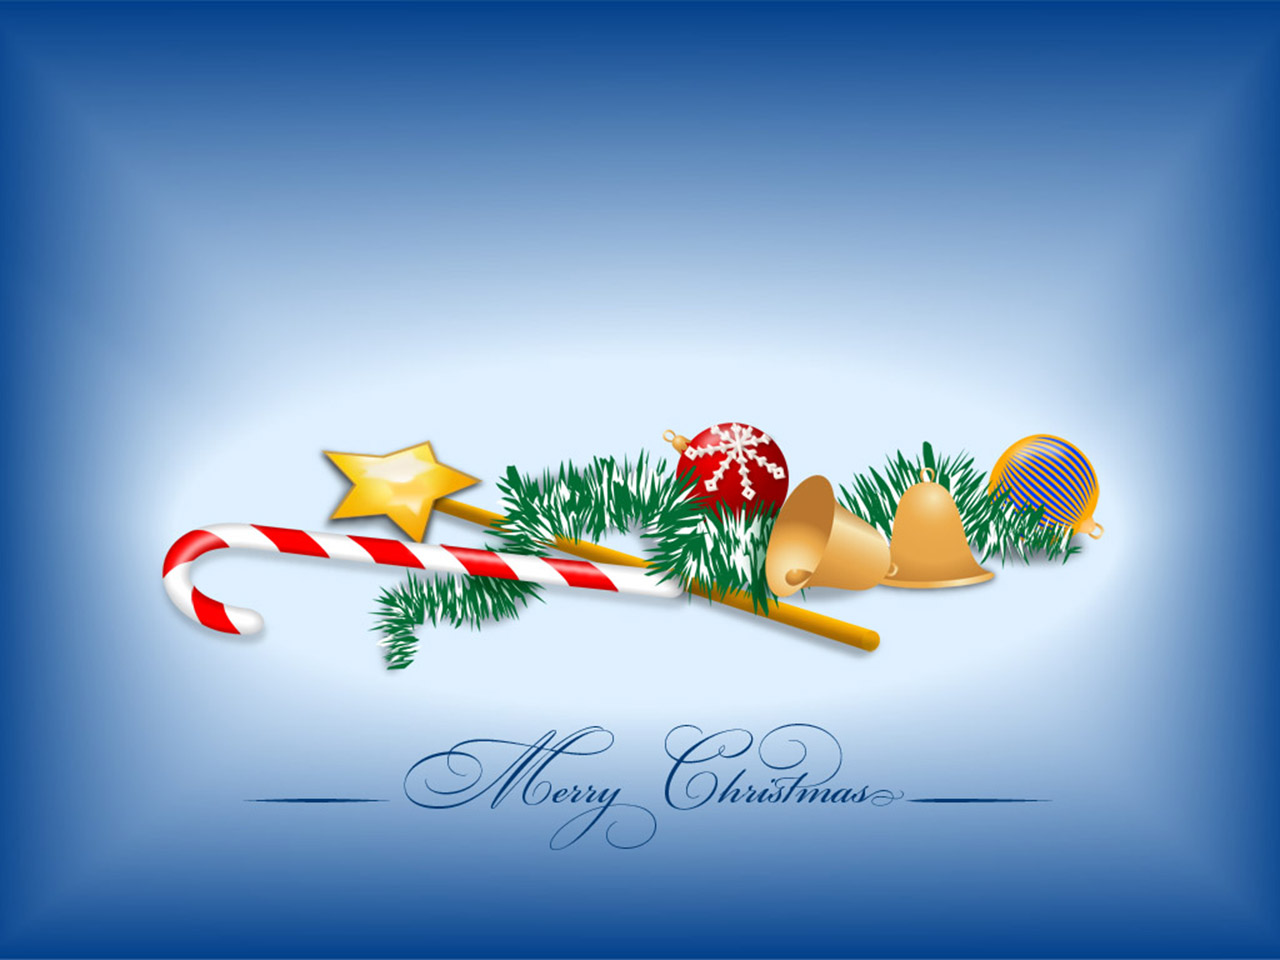 Christmas wallpaper, Free Wallpaper Downloads: Merry Christmas 2013 ...